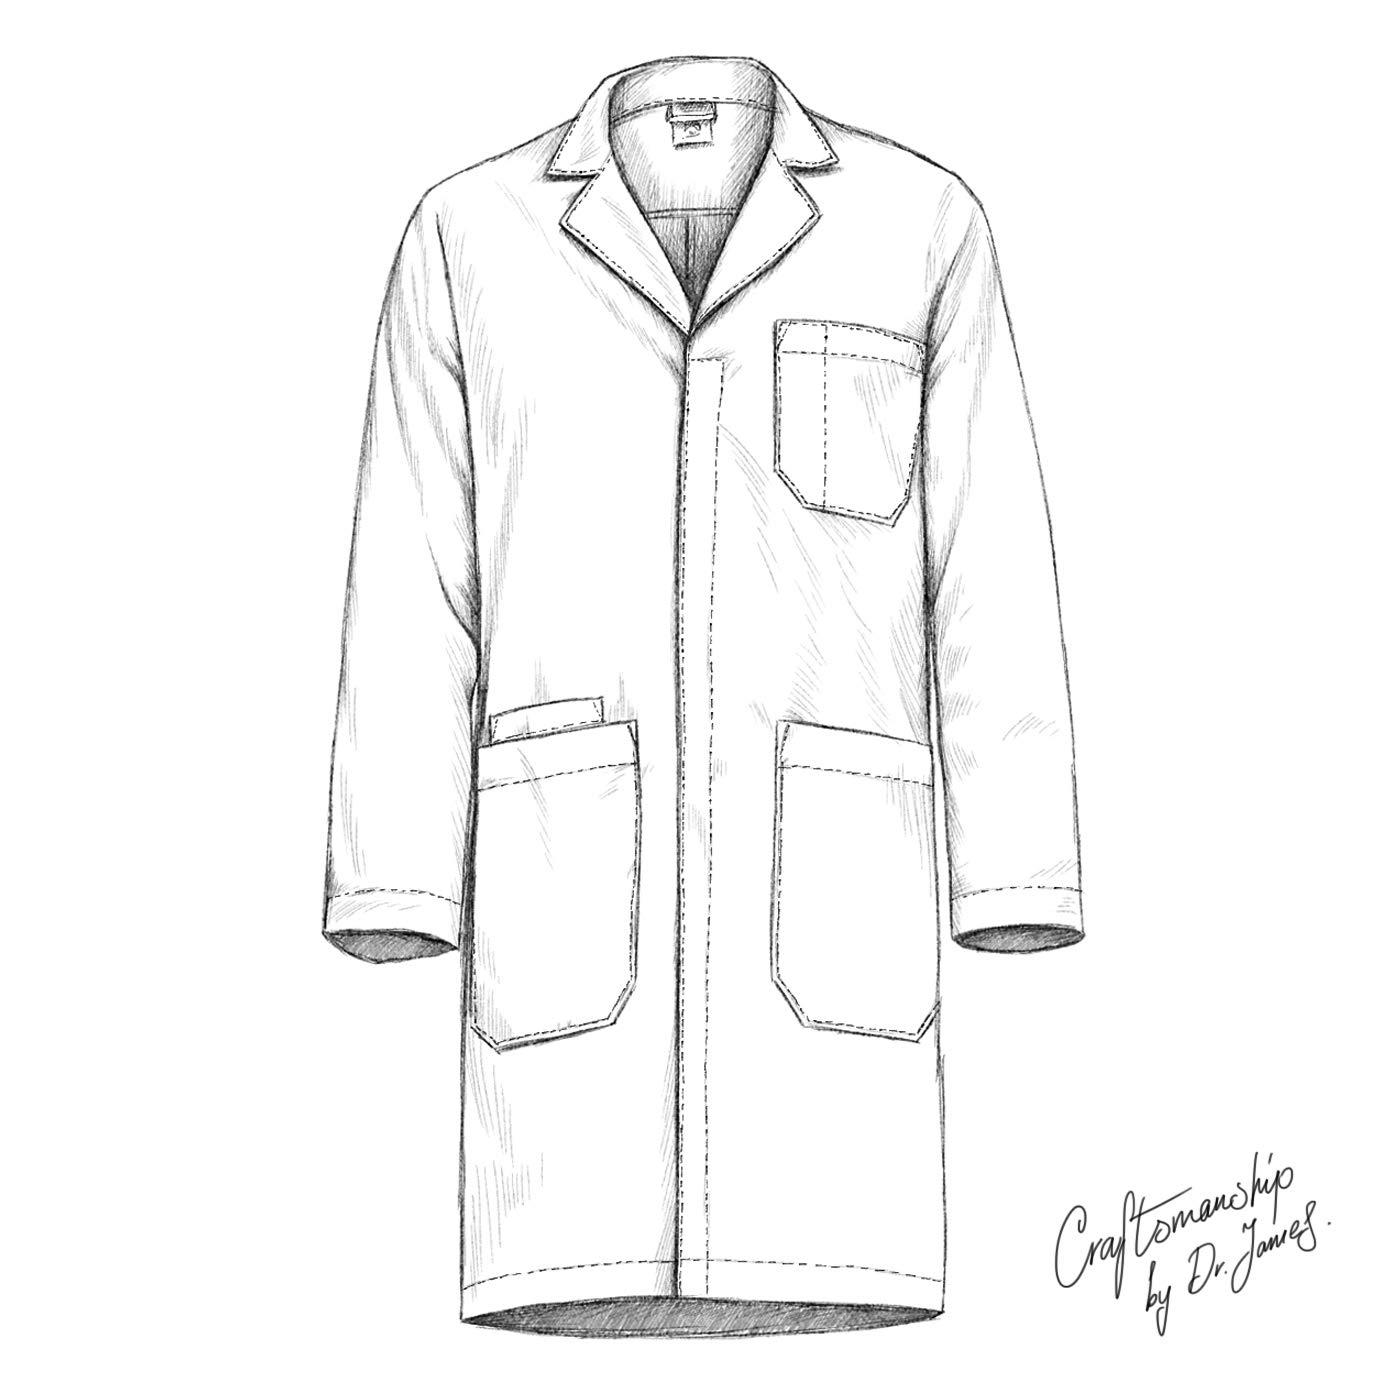 Dr. James Professionally Designed Unisex Lab Coat - 39 Inch Length US-01-2XS by Dr. James (Image #5)